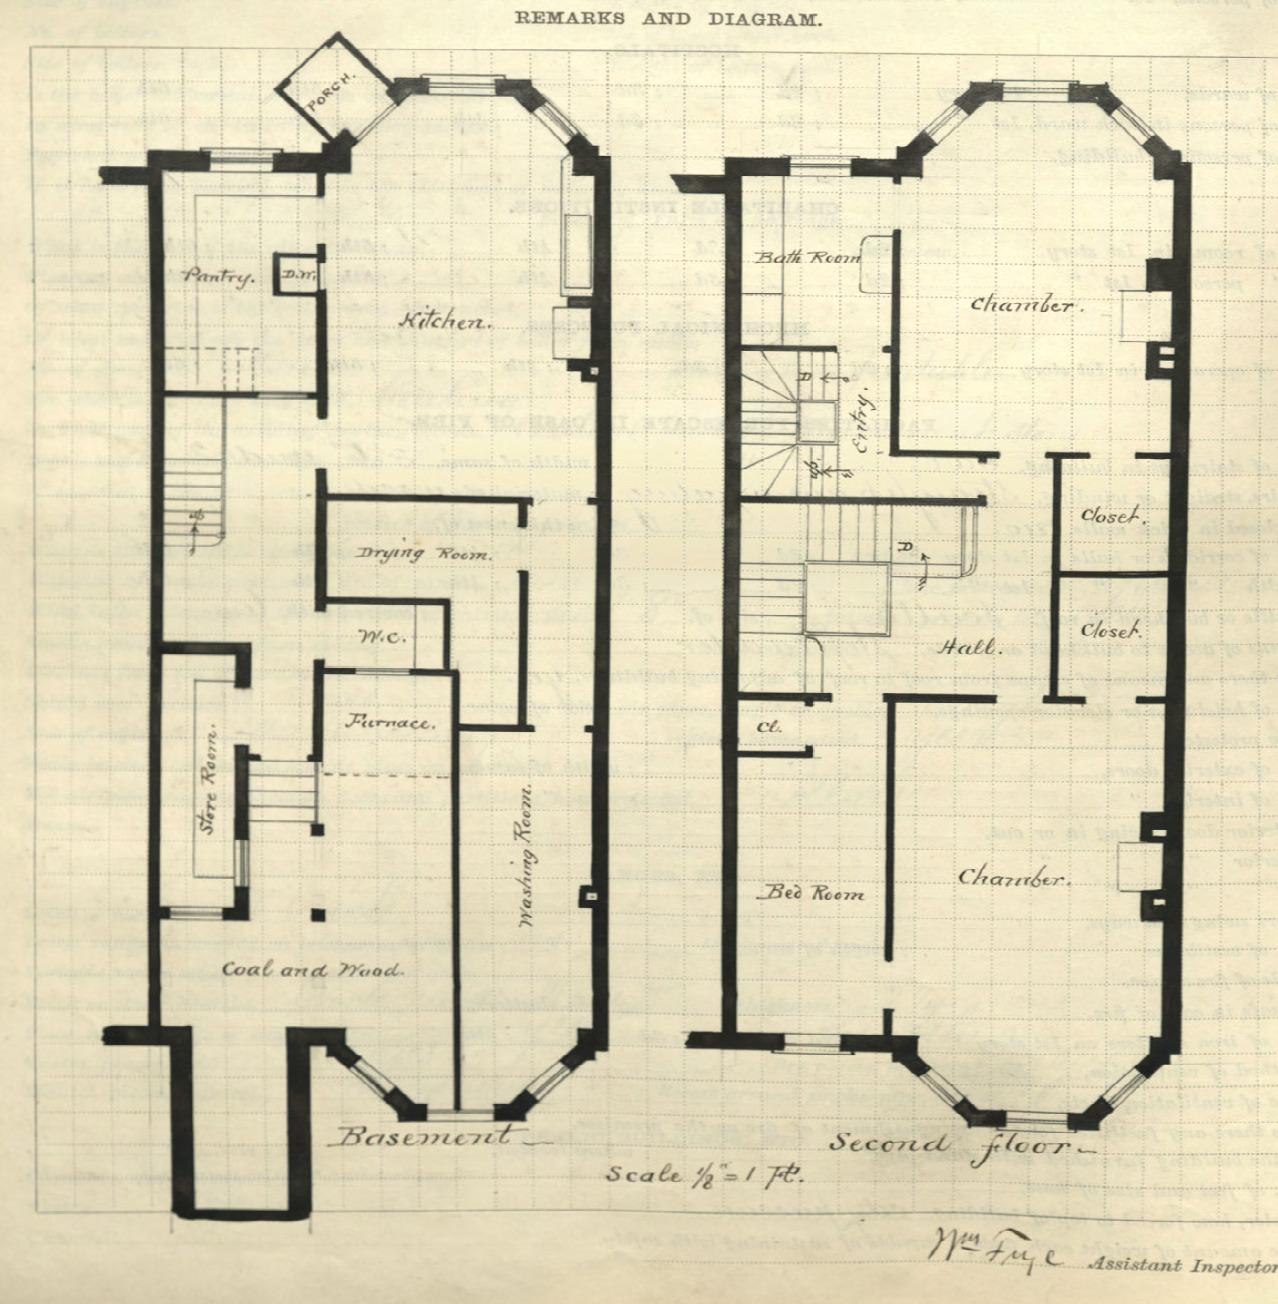 320 marlborough back bay houses for Marlborough house floor plan